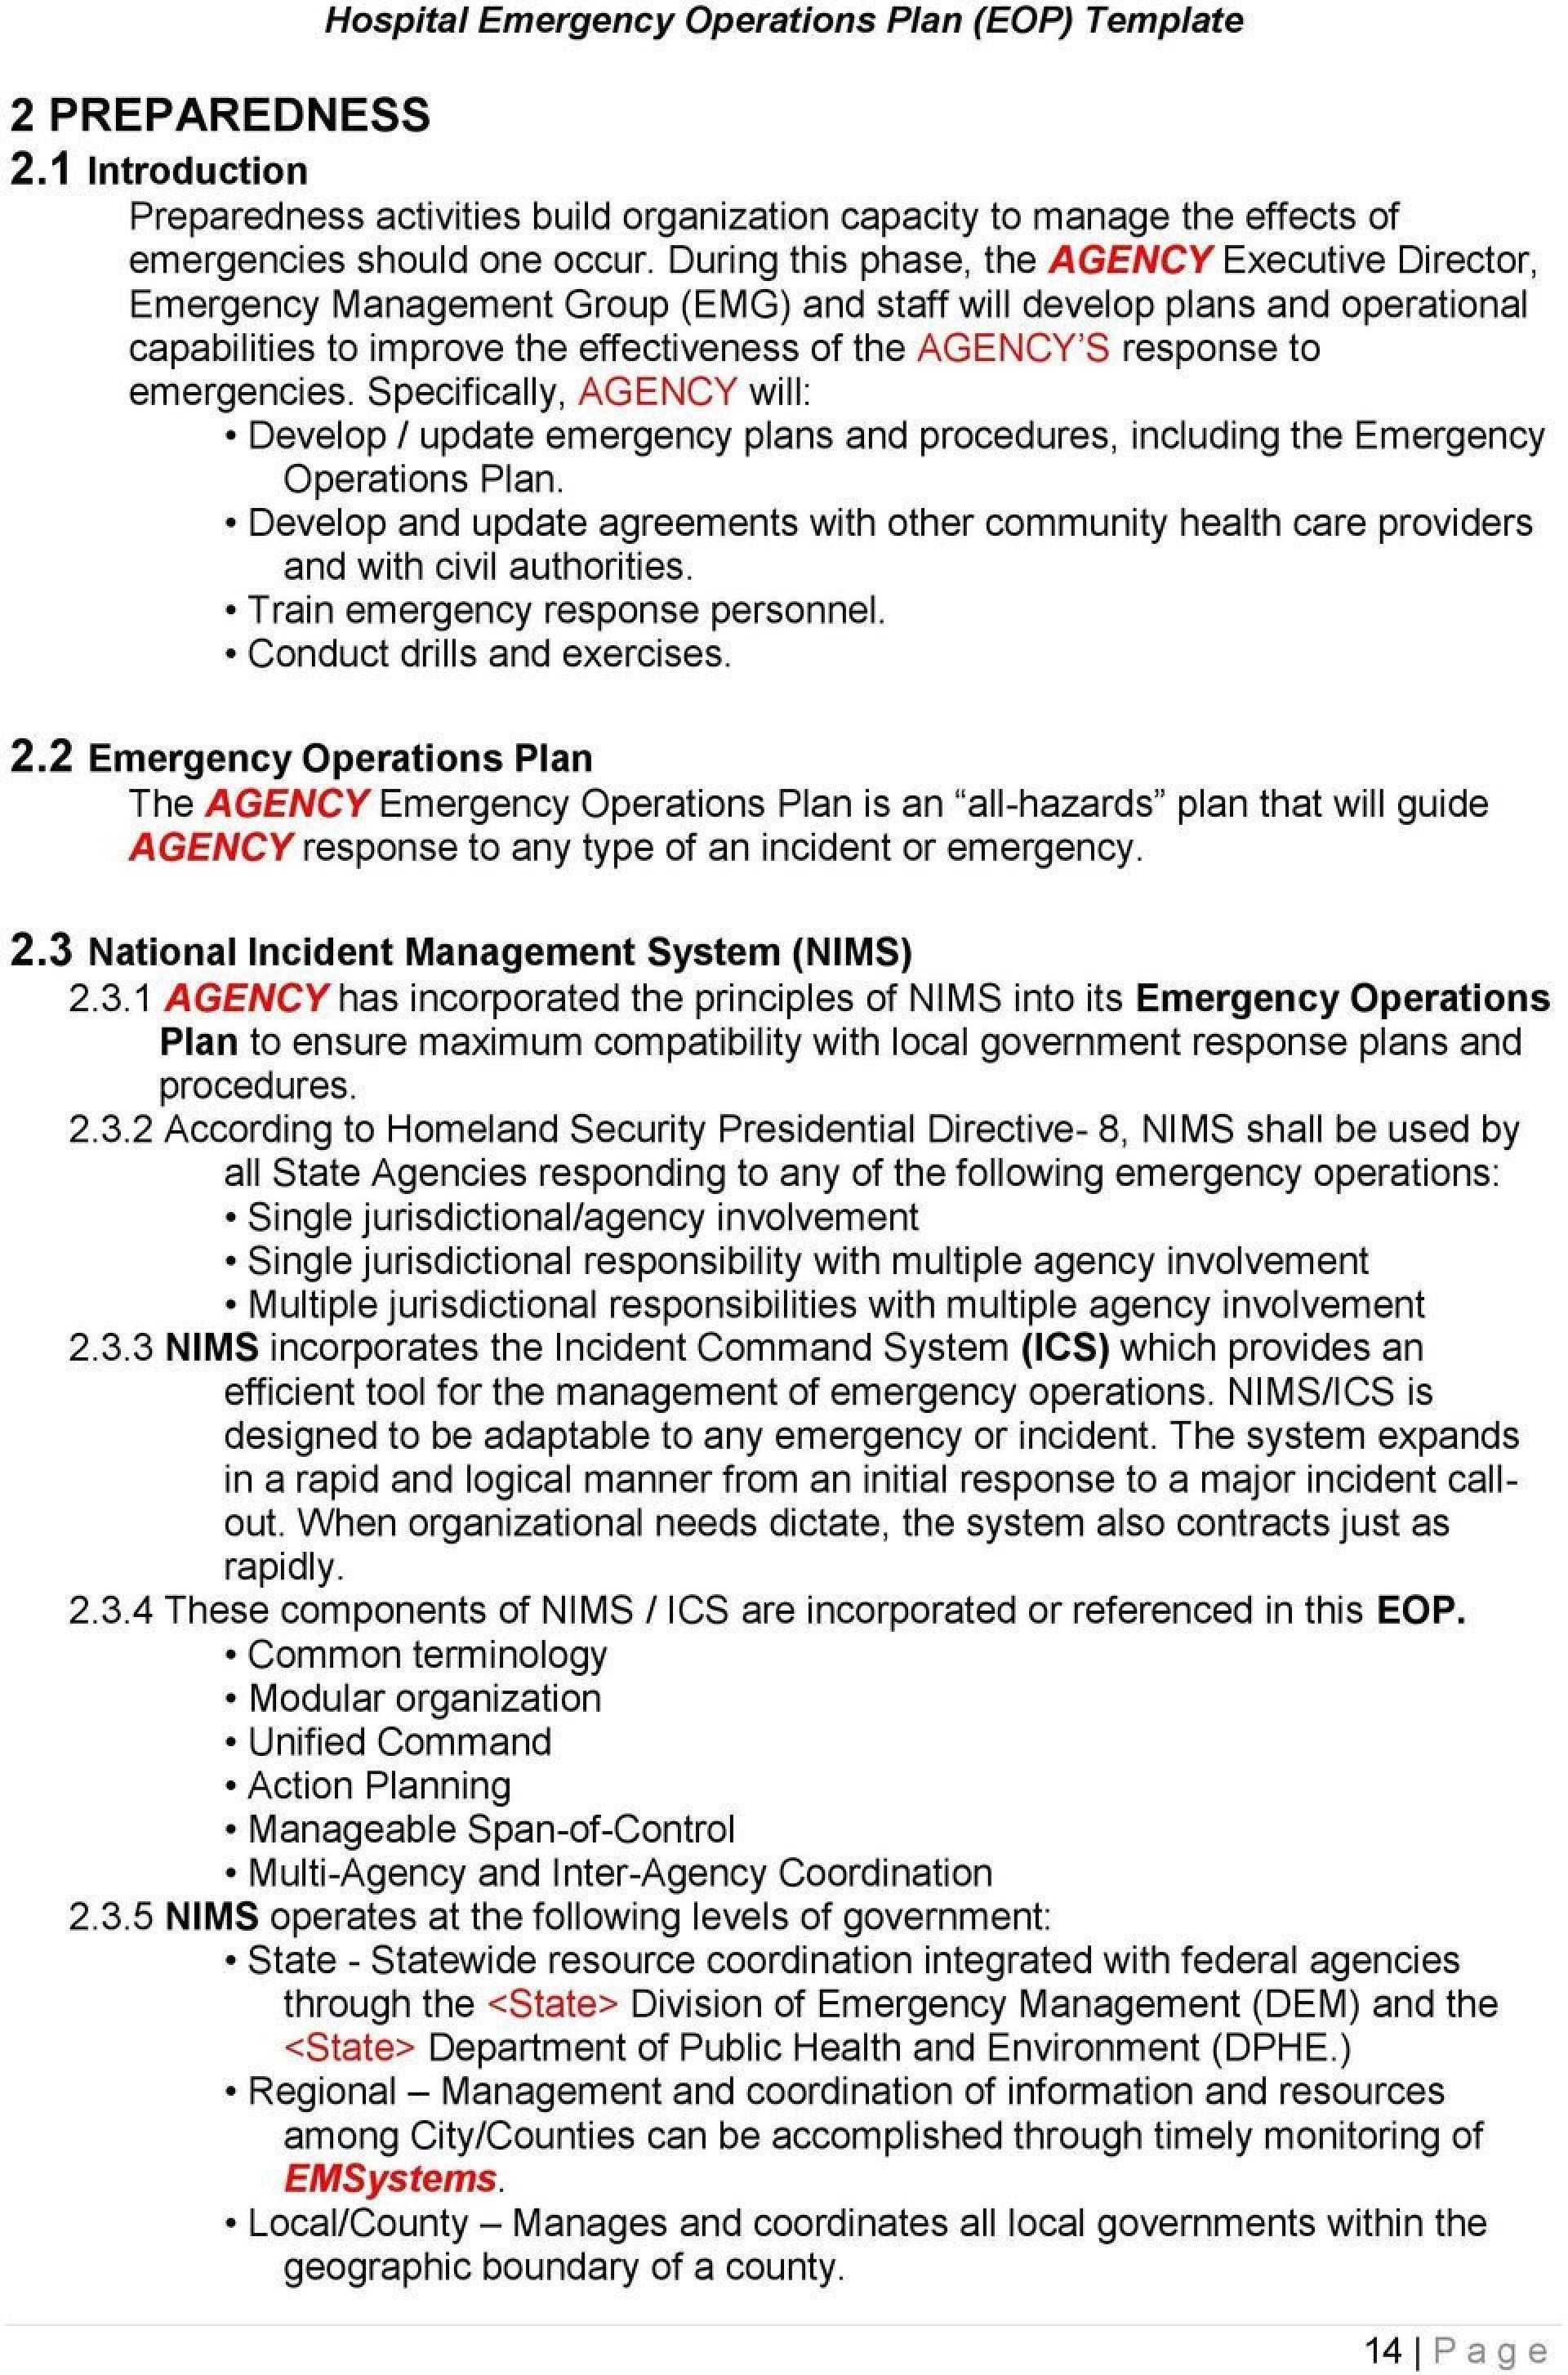 000 Sensational School Emergency Operation Plan Template Michigan High Resolution 1920